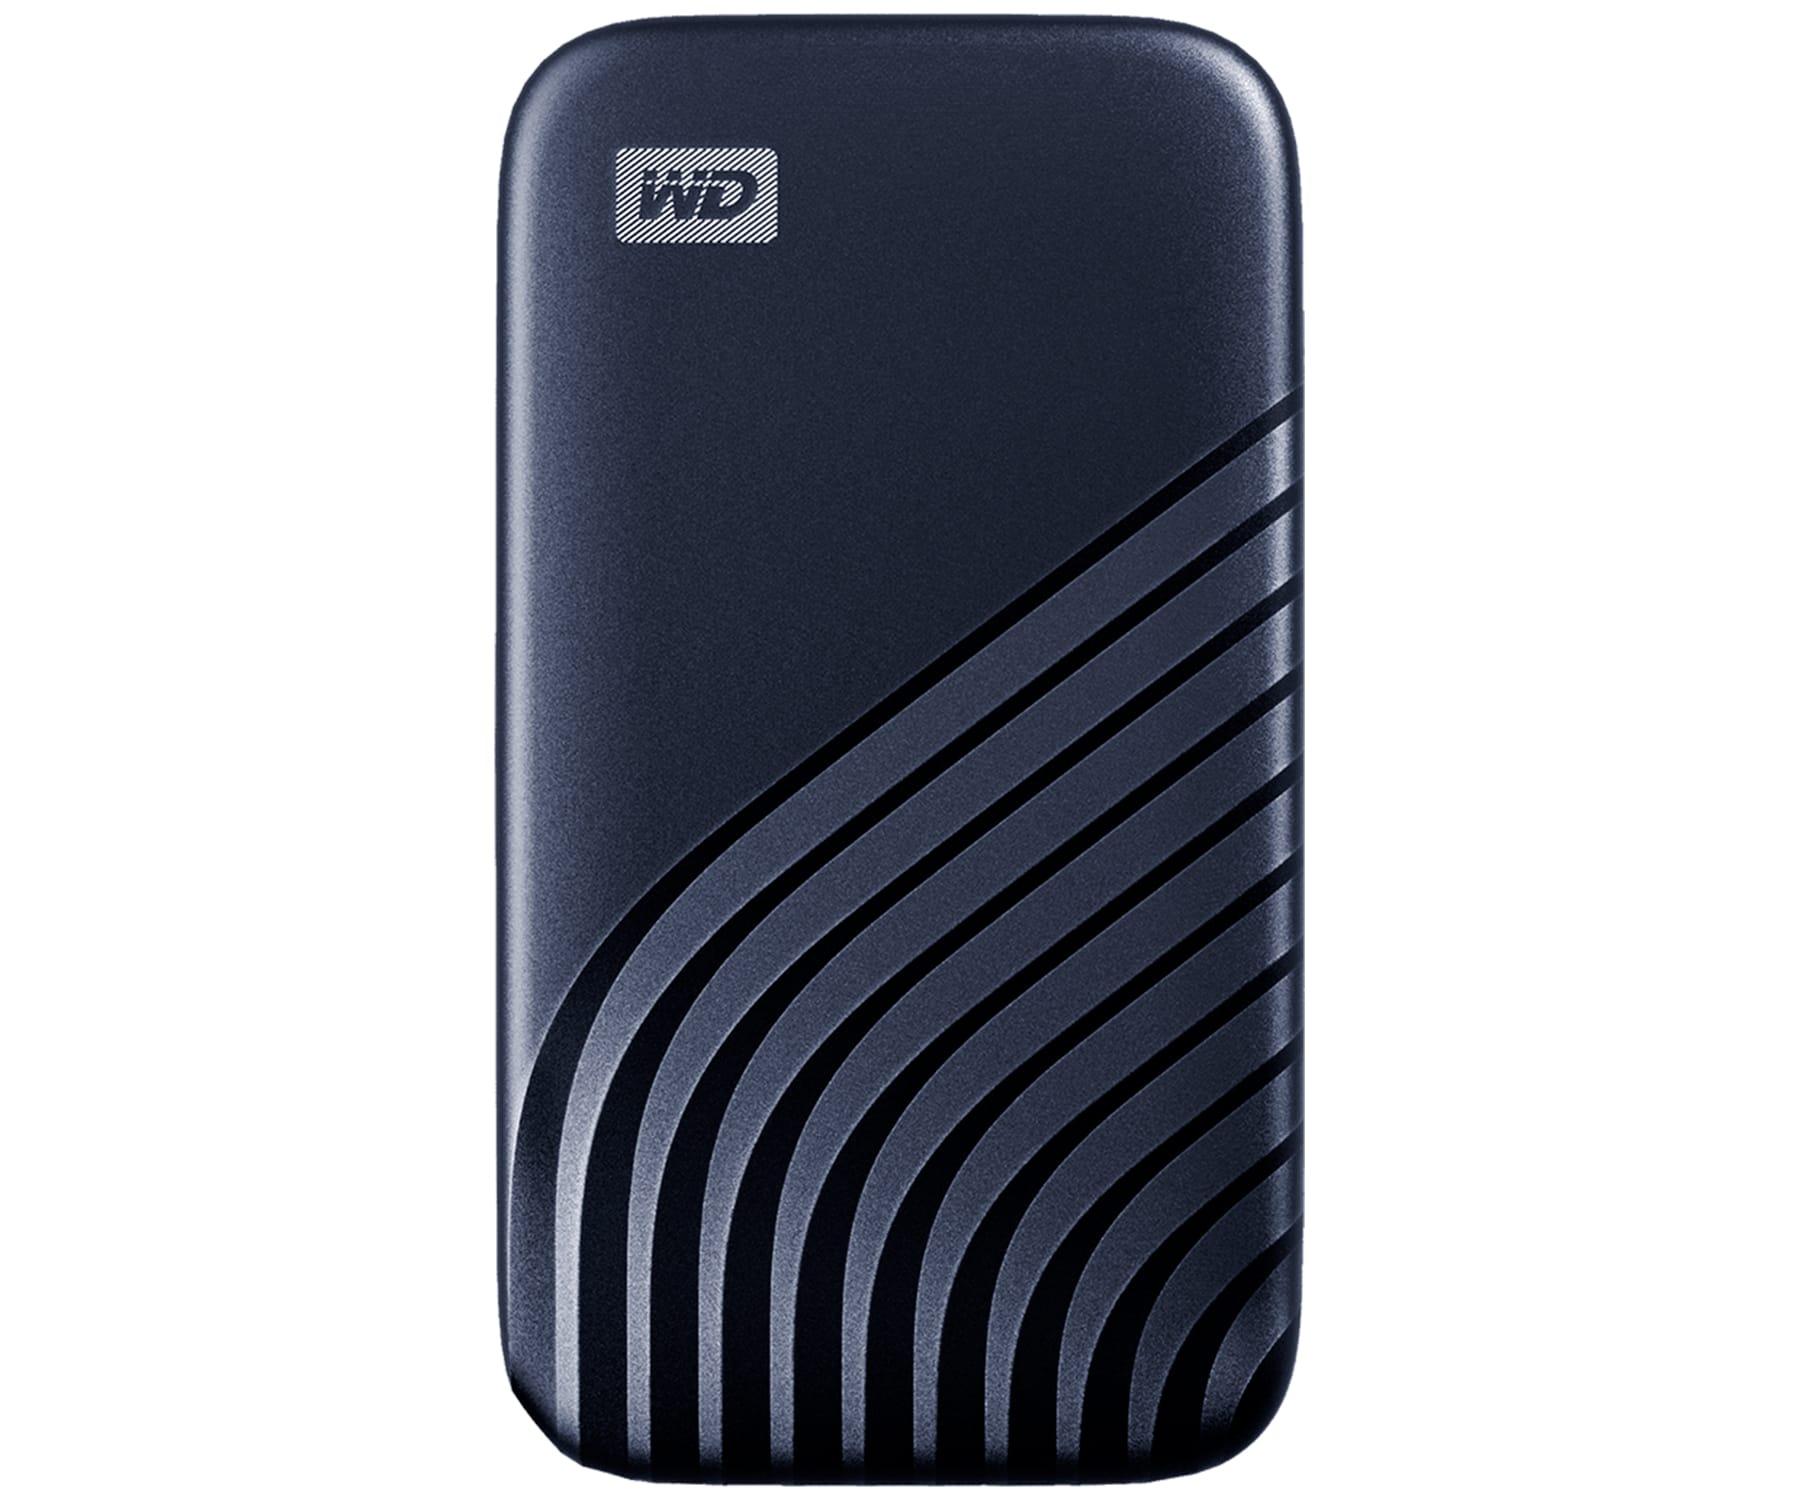 WESTERN DIGITAL MY PASSPORT SSD 1TB DISCO DURO EXTERNO USB-C NEGRO